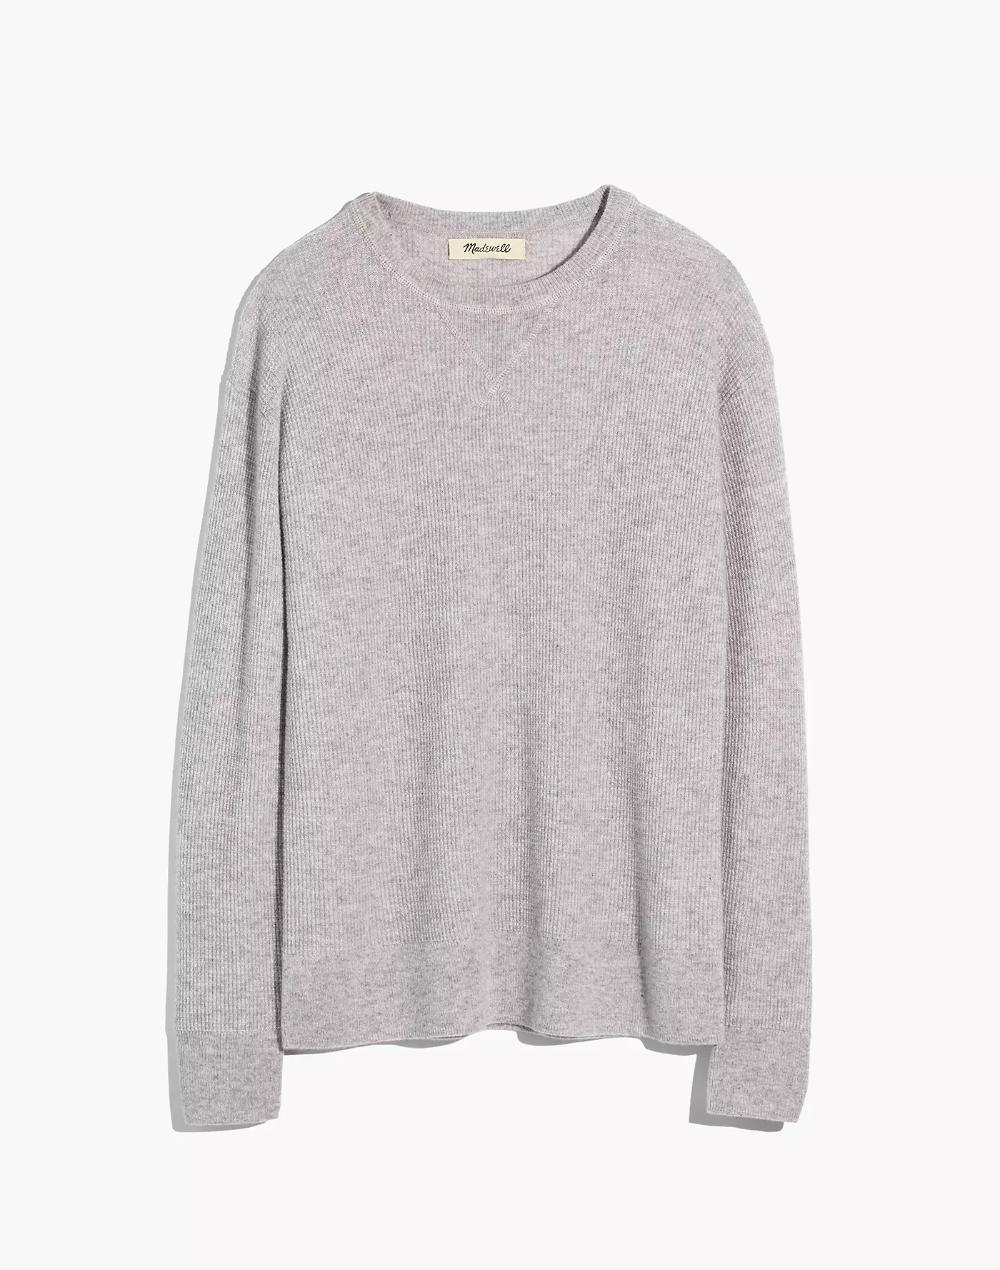 Cashmere Sweater Cashmere Sweater Men Mens Cashmere Sweaters [ 1270 x 1000 Pixel ]